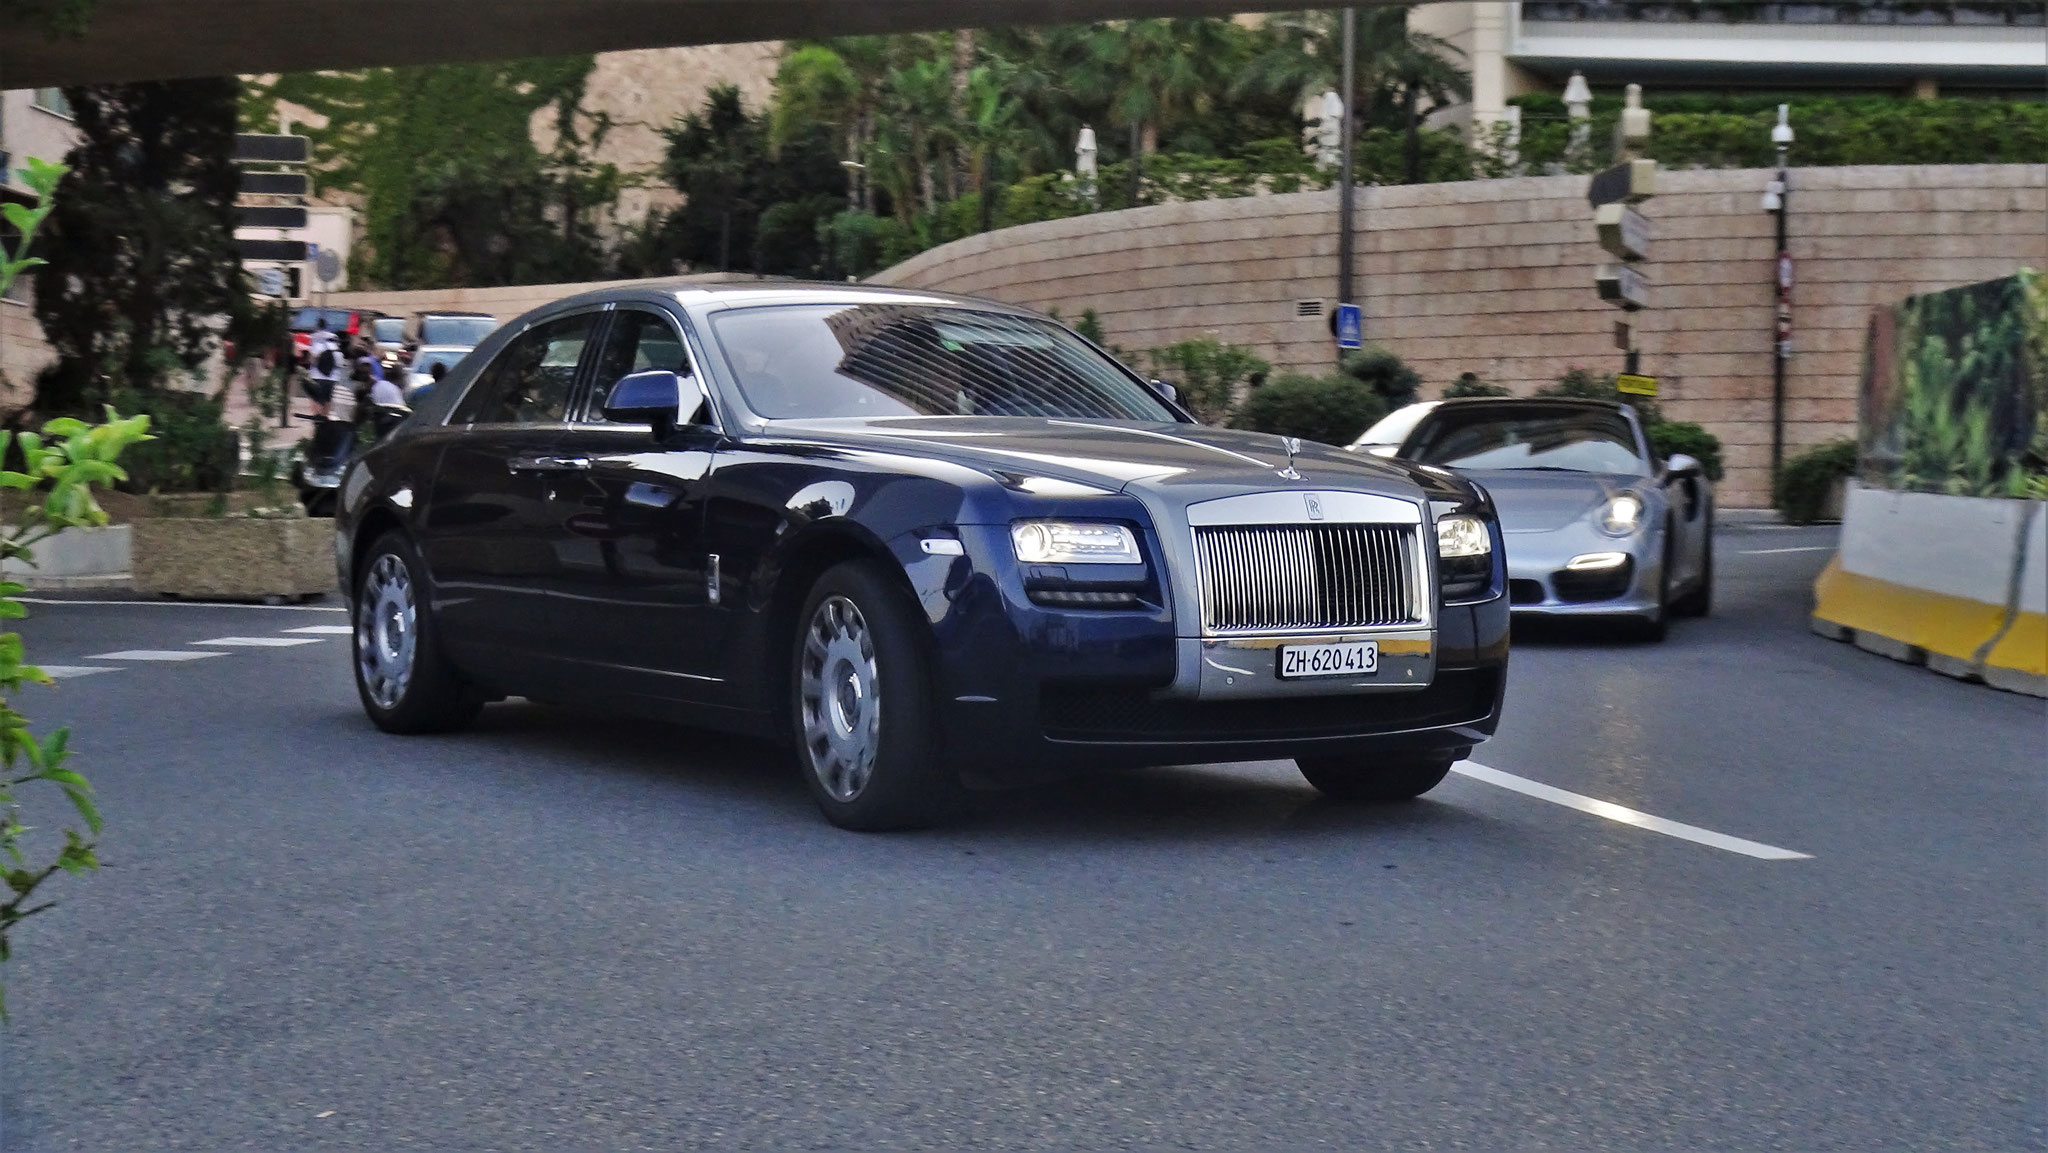 Rolls Royce Ghost - ZH-620413 (CH)